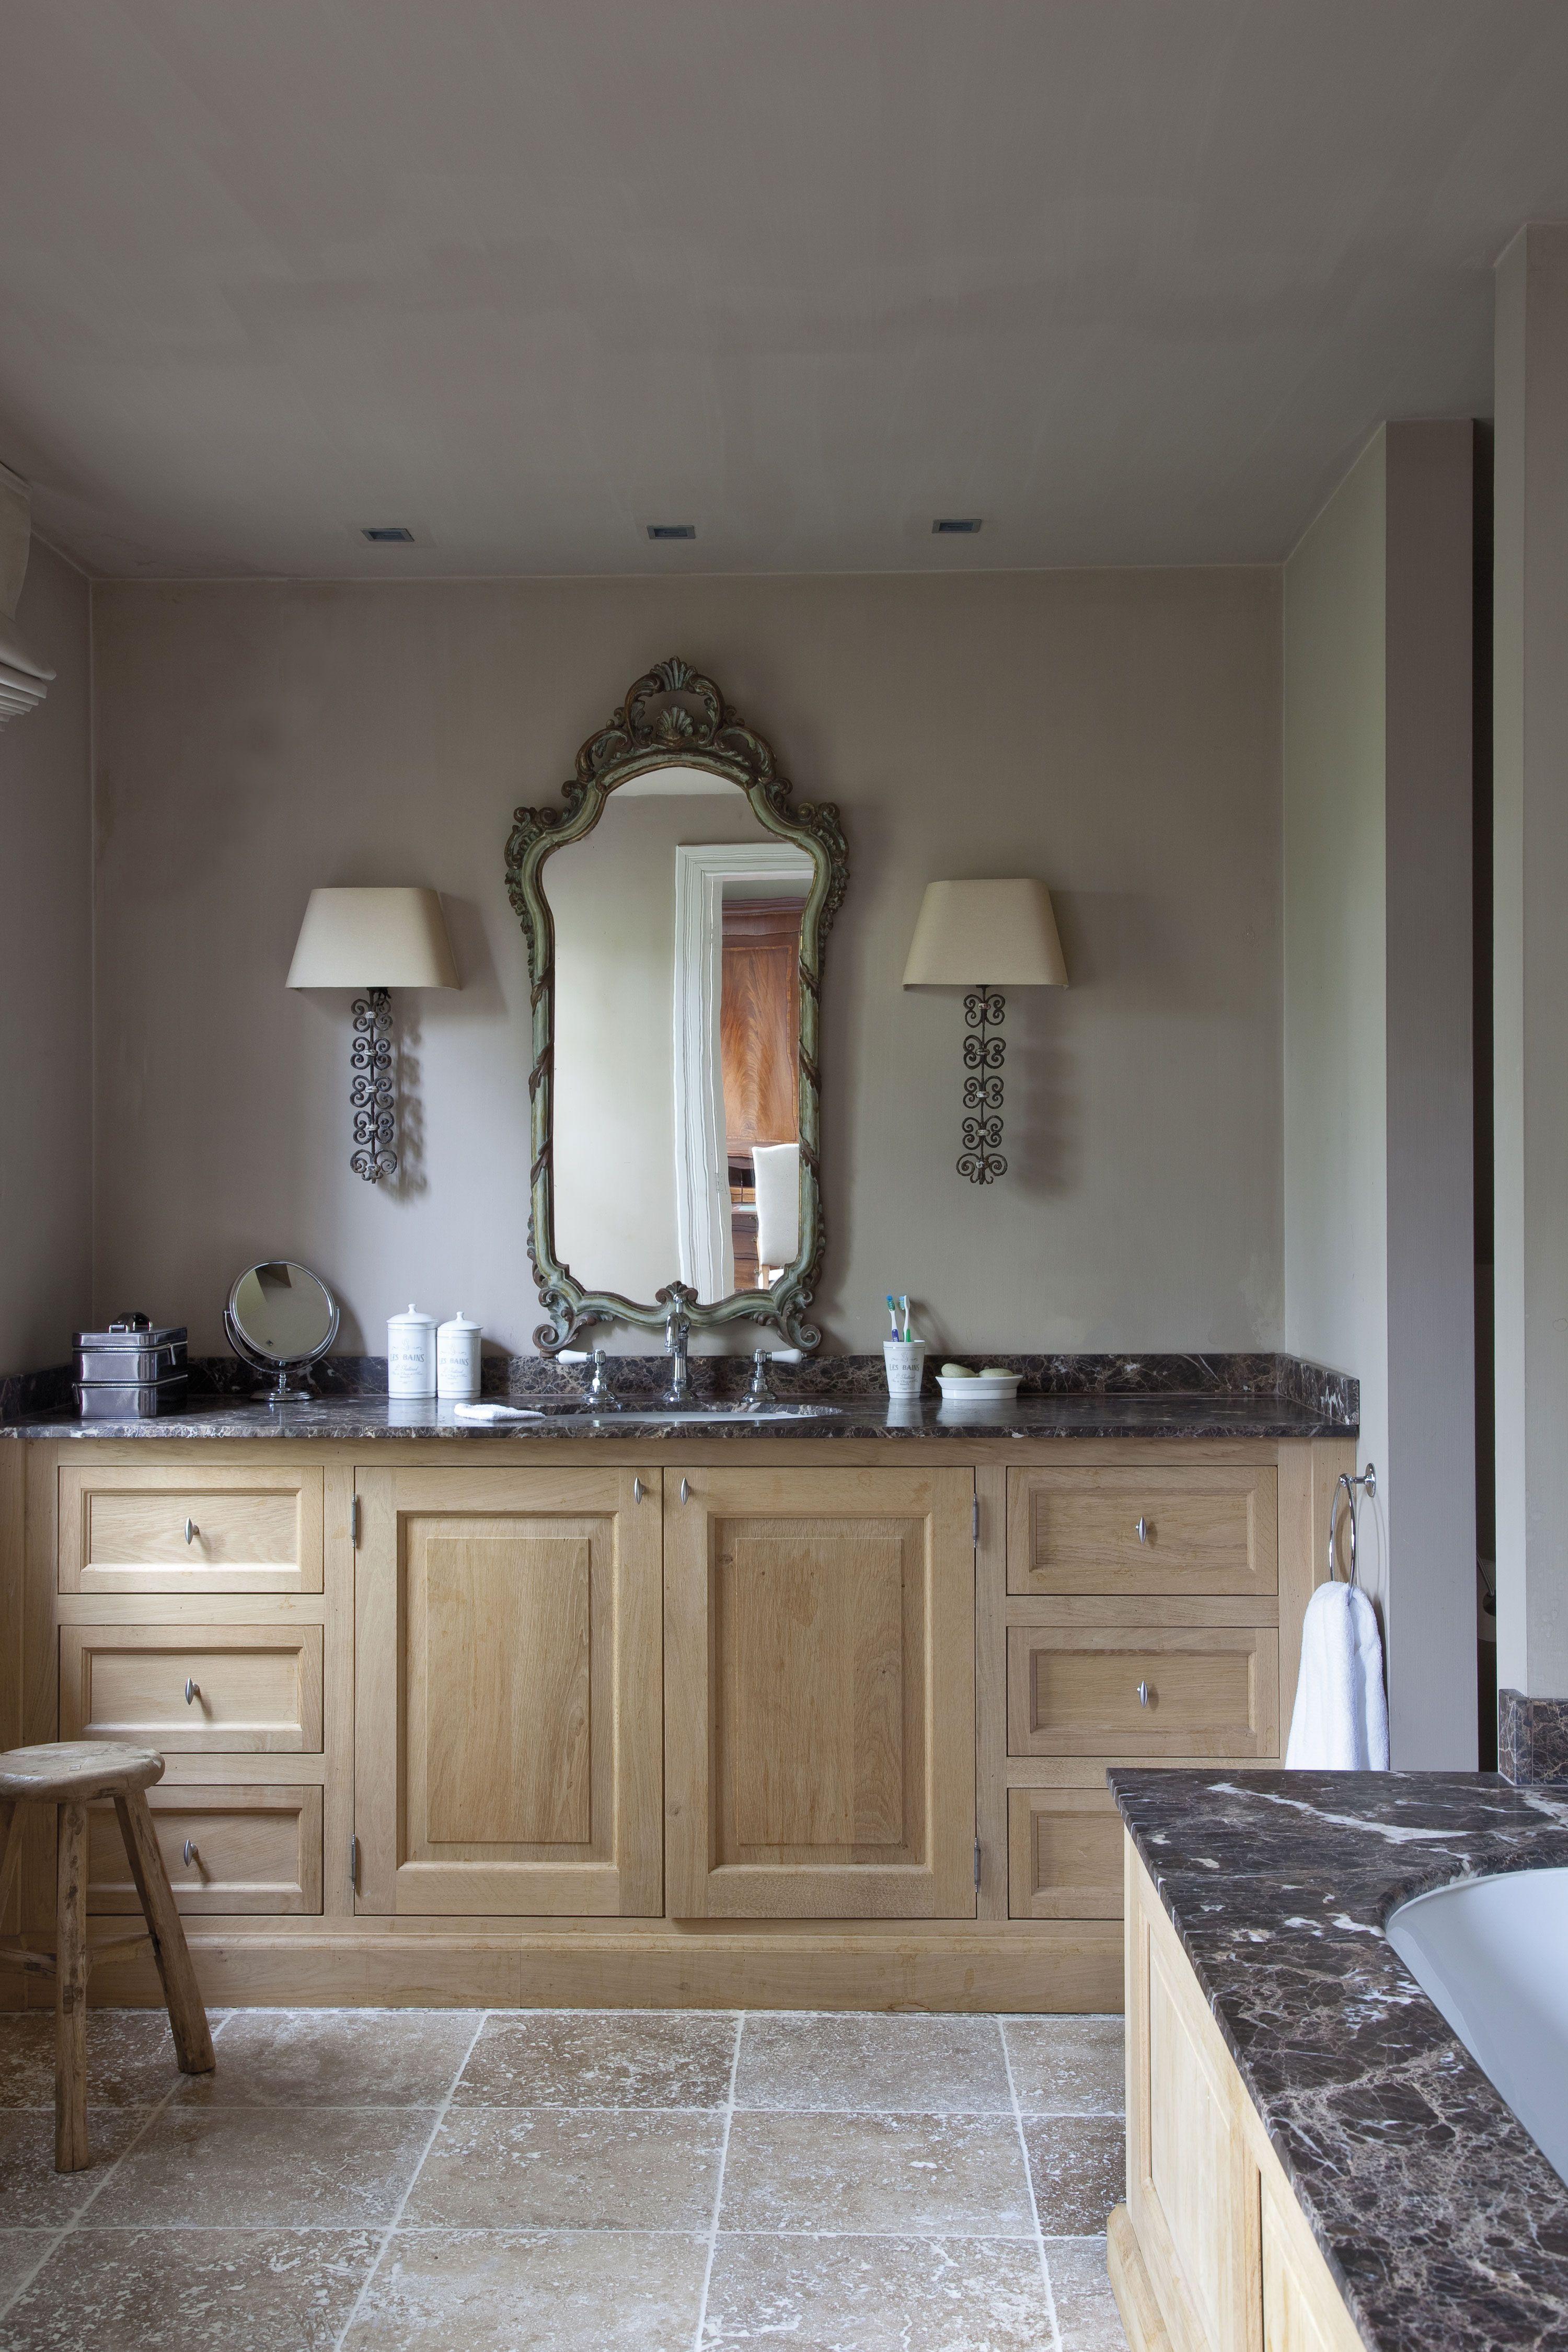 jv n53 la salle de bain mle le travertin moka du sol et